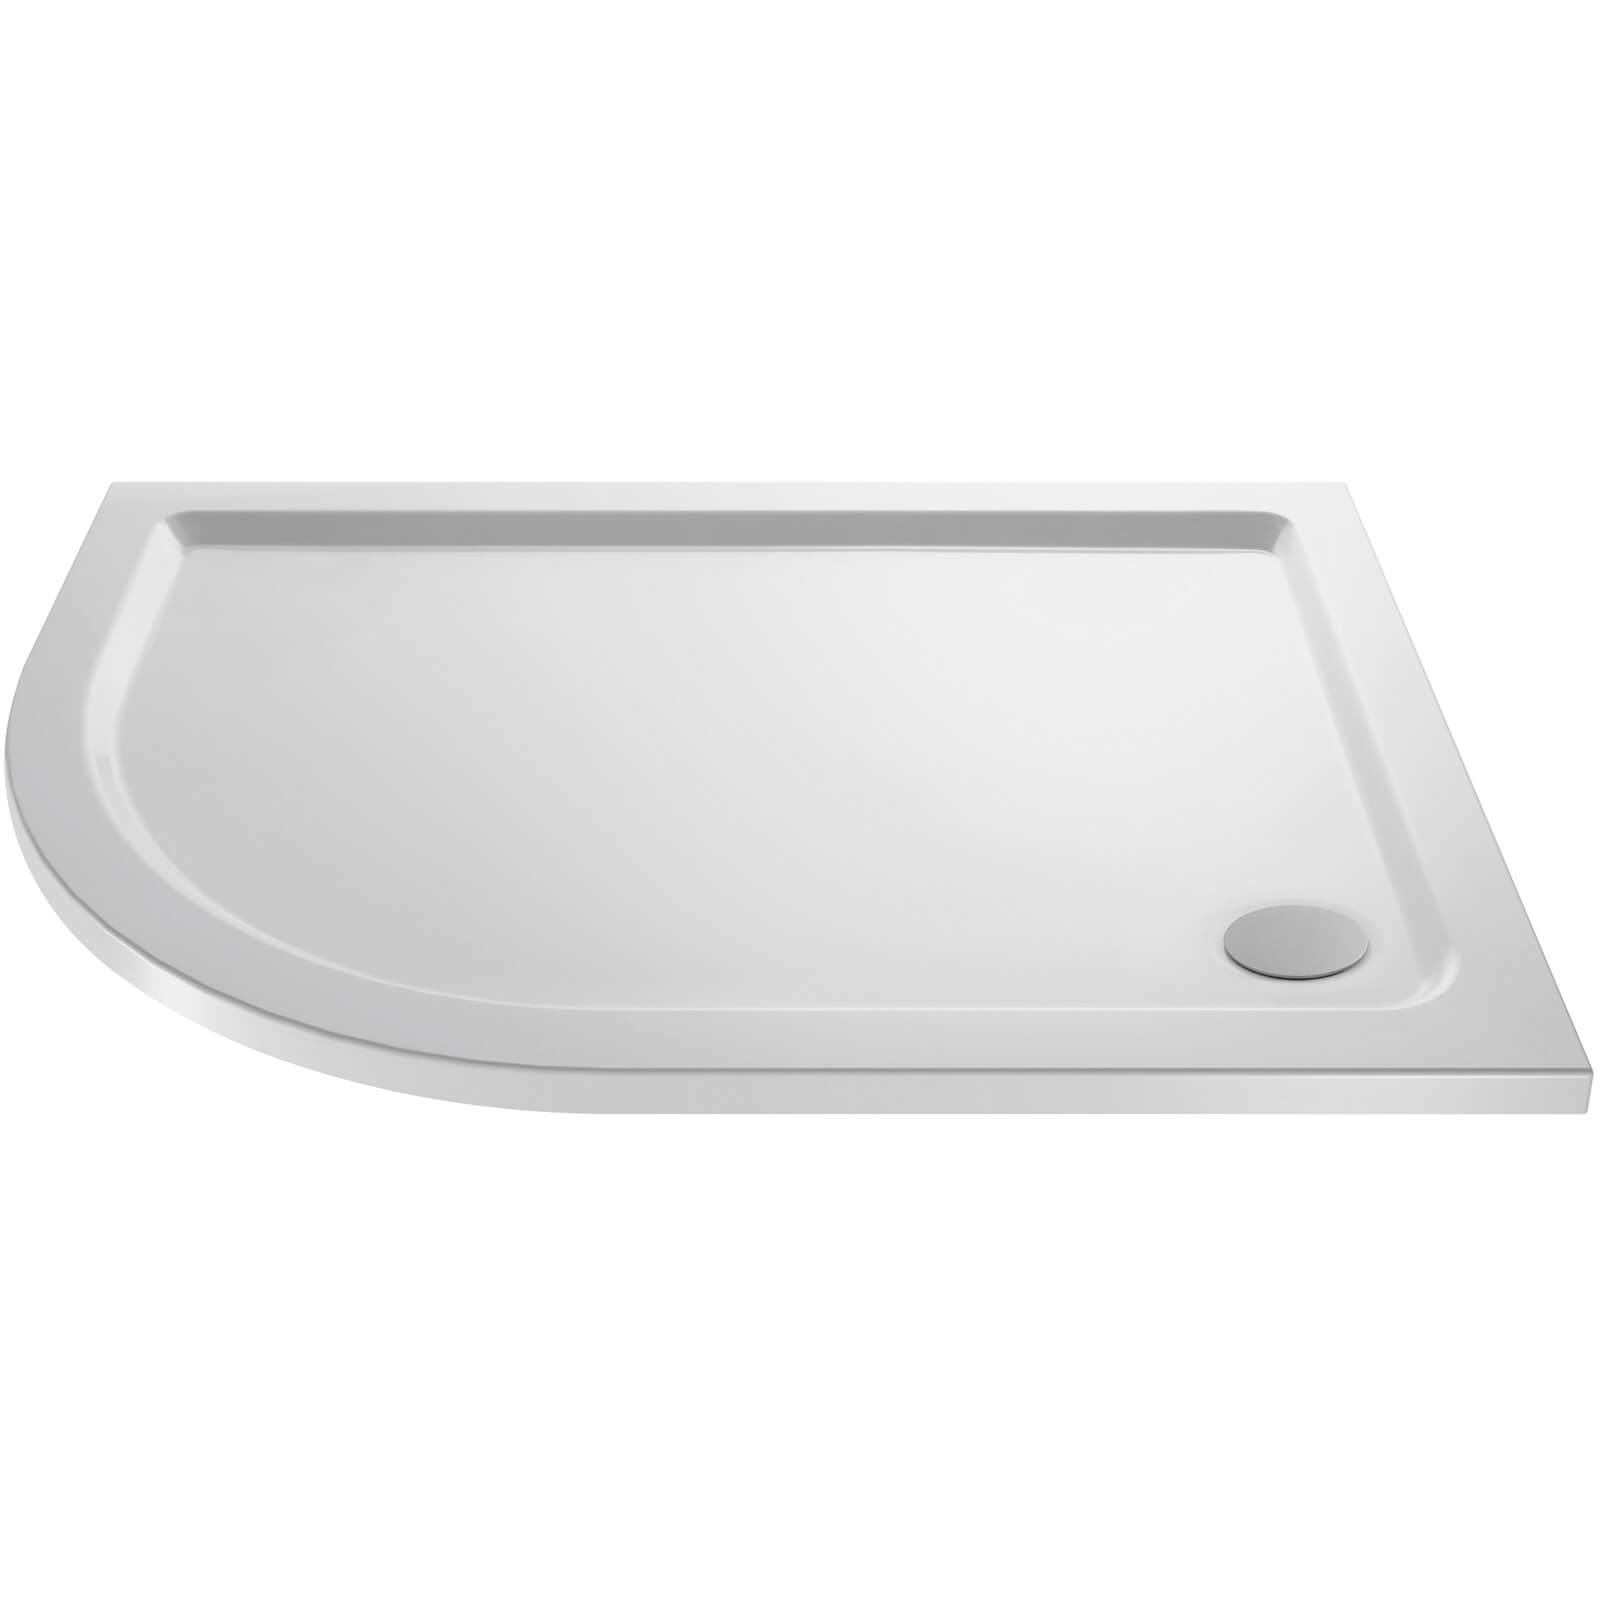 Balterley Left Hand Offset Quadrant Shower Tray - 1200 x 800mm